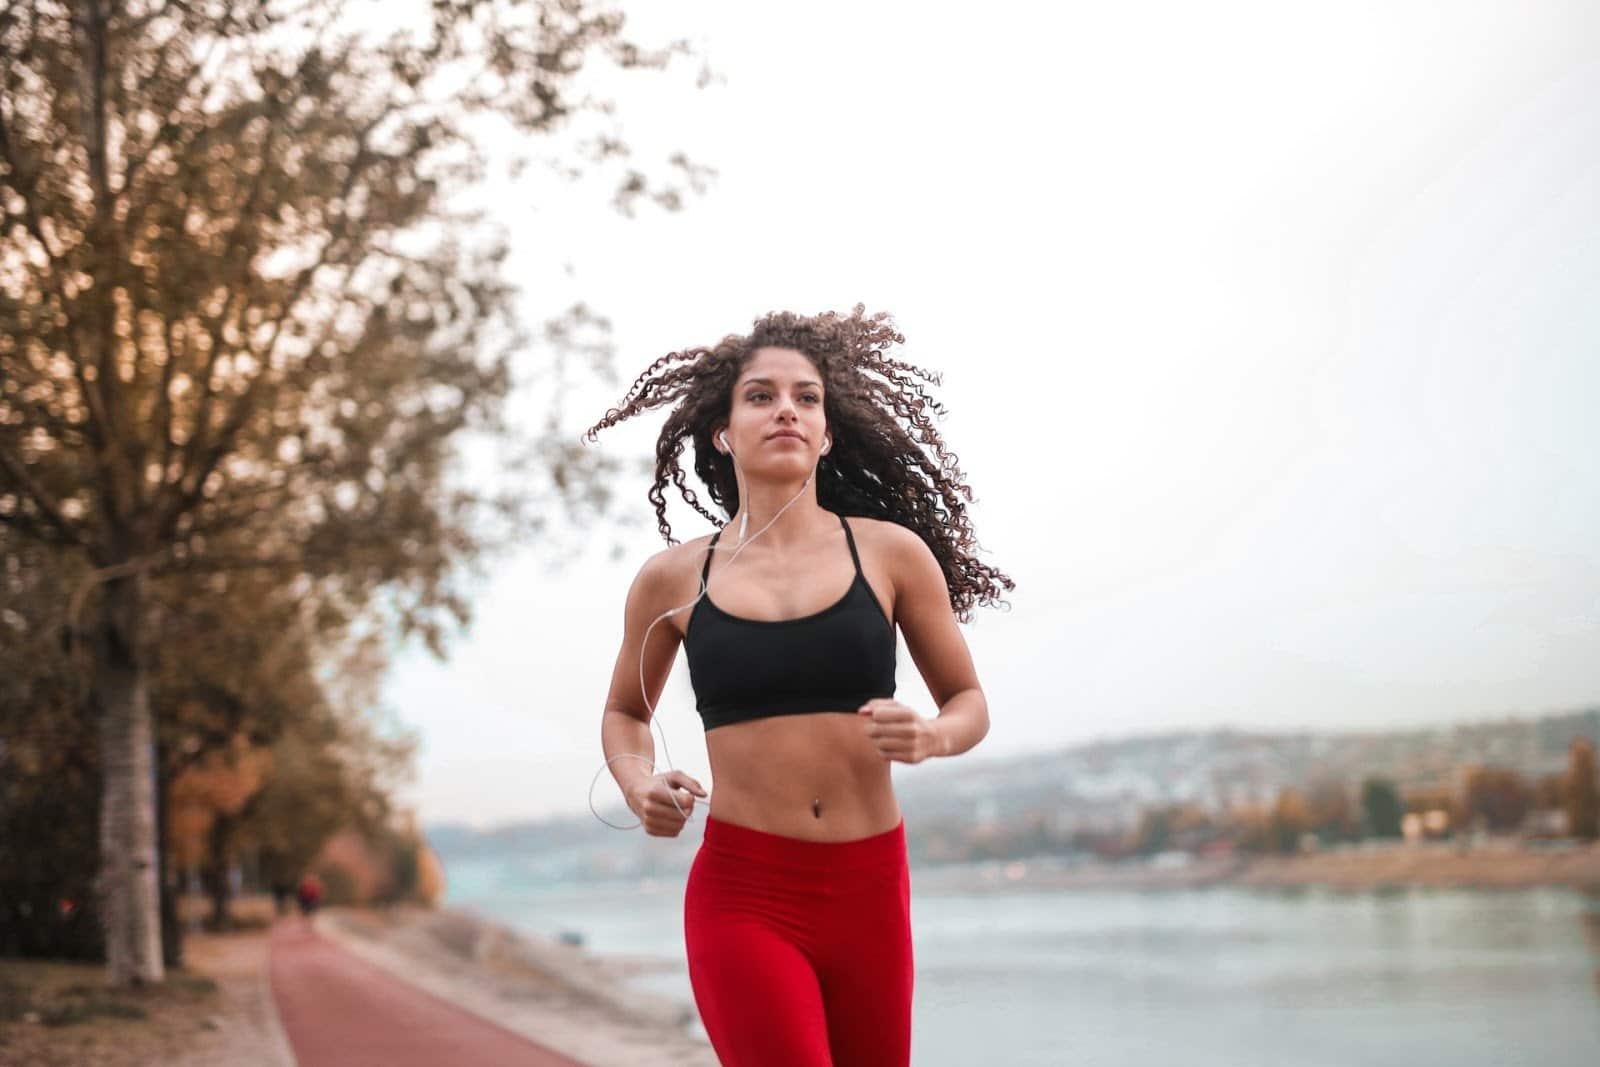 woman-in-black-sports-bra-running